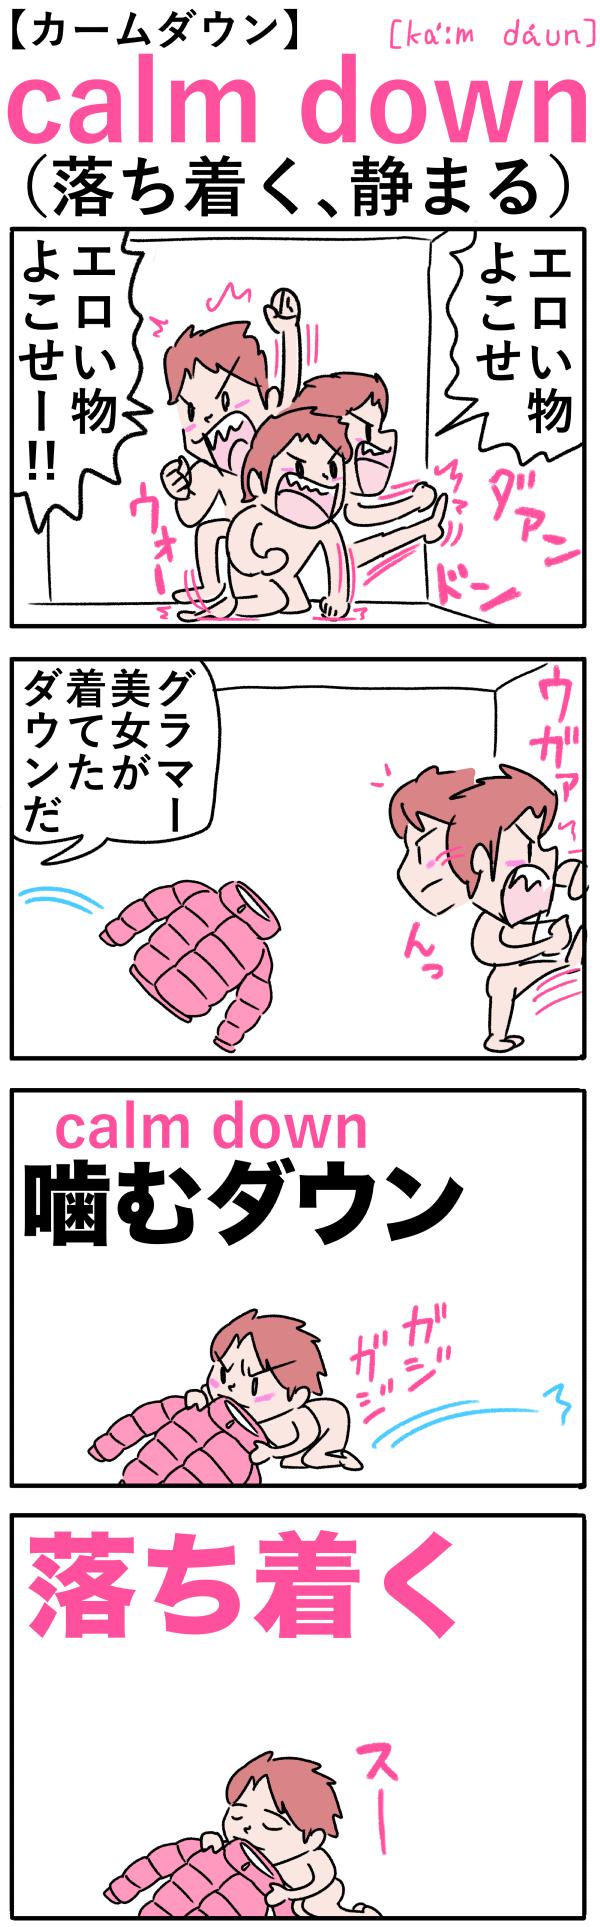 calm down(落ち着く)の語呂合わせ英単語